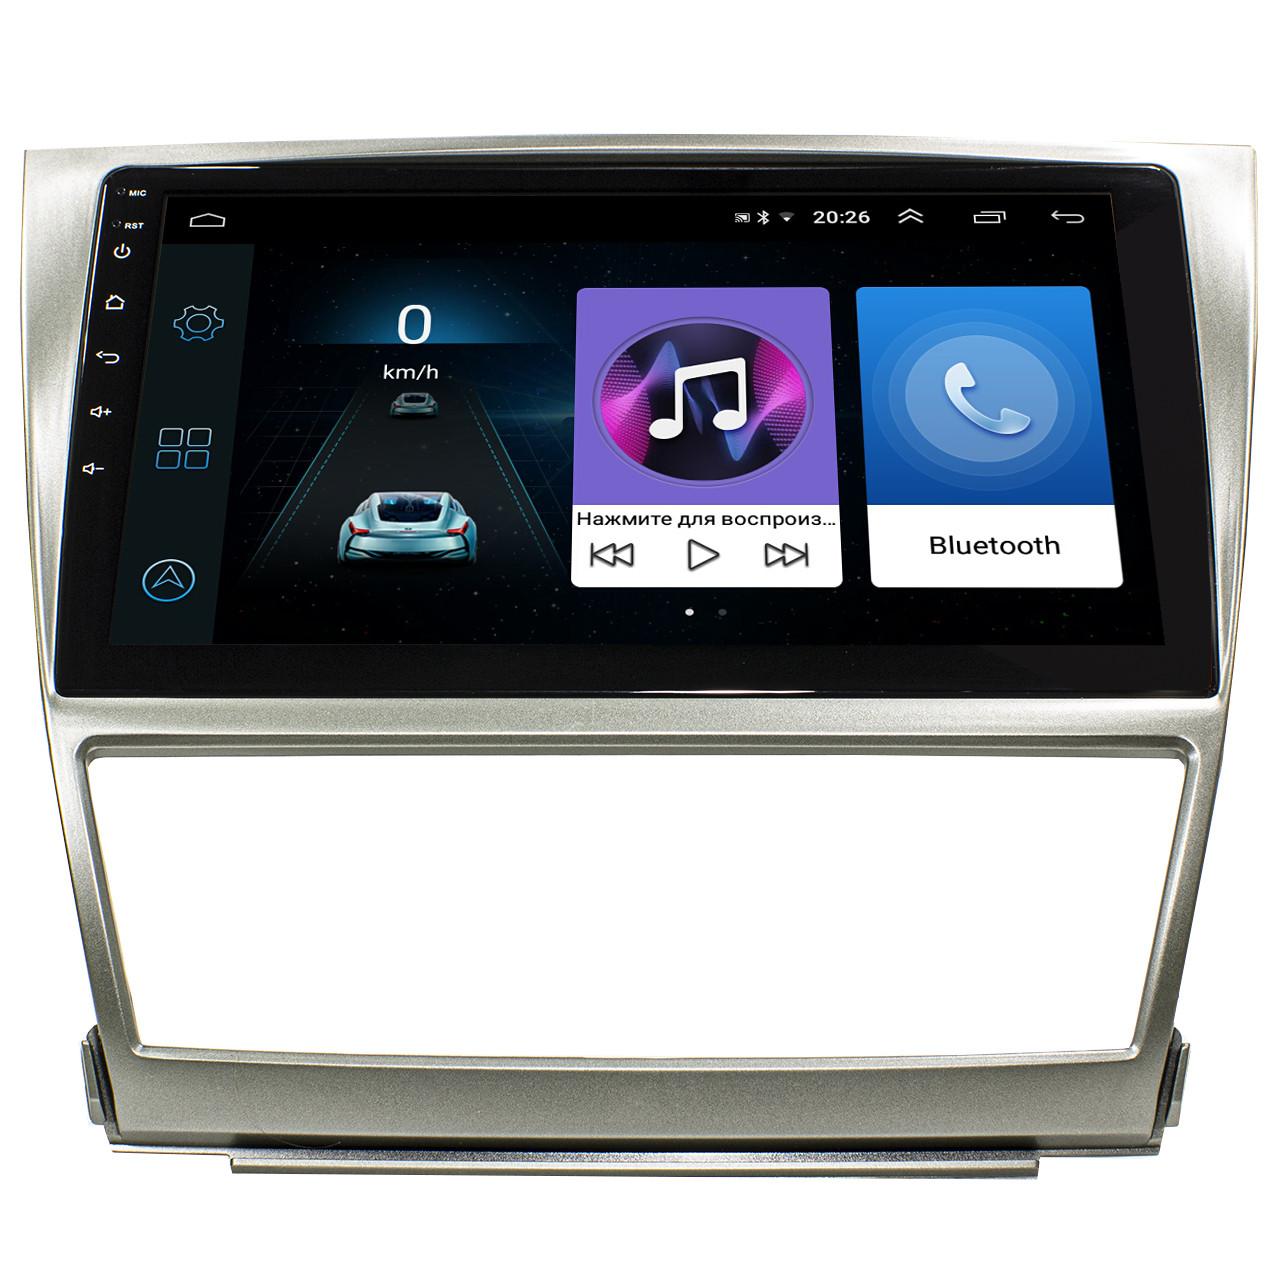 "Штатная автомобильная магнитола 10"" Toyota Camry (2006-2011 г.) 2/32 Гб 4 ядра WiFi Android (Американка)"